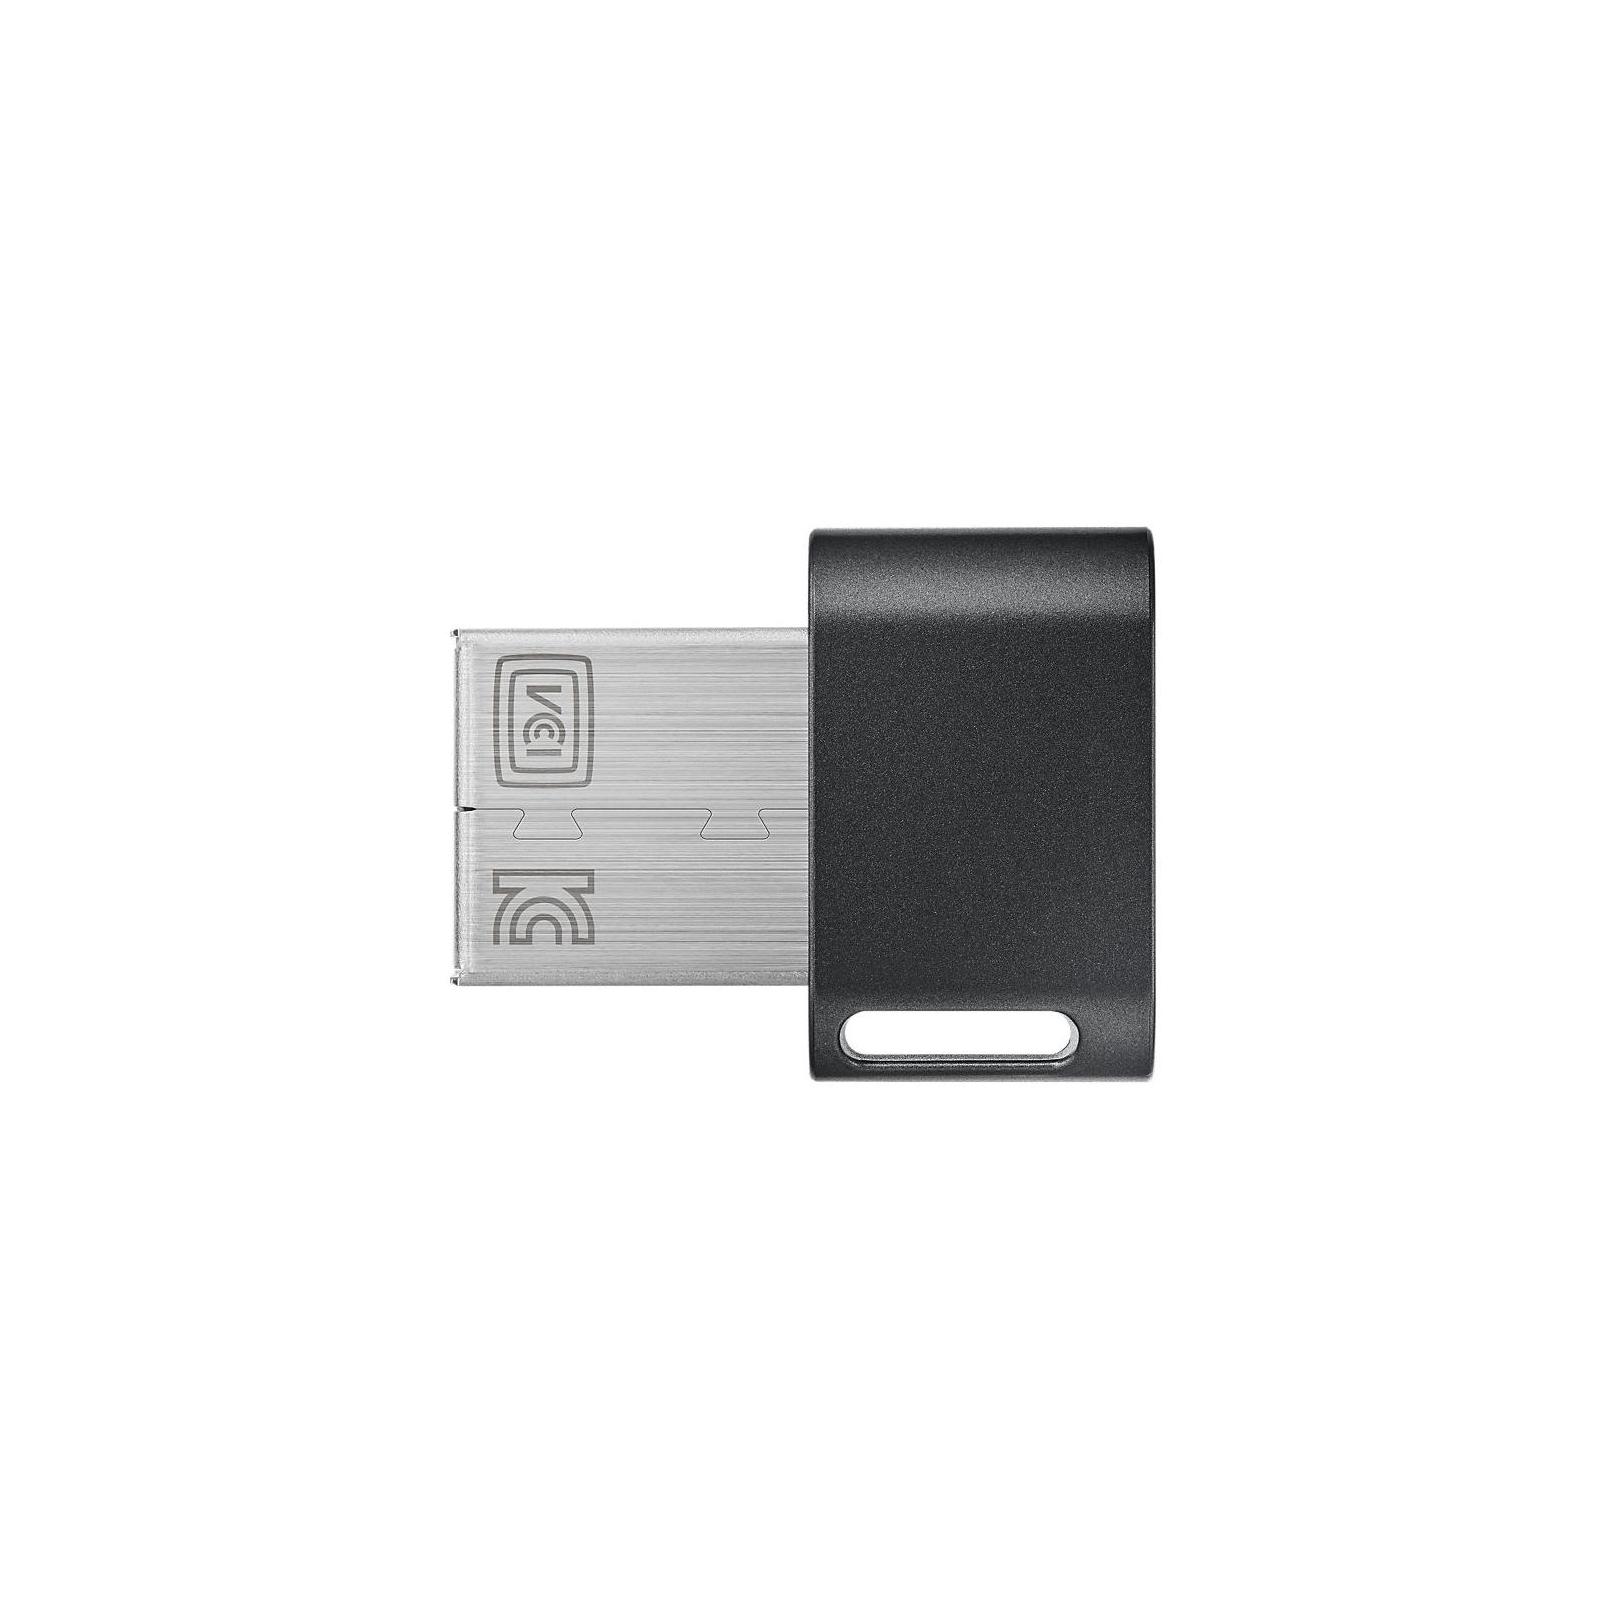 USB флеш накопитель Samsung 64GB Fit Plus USB 3.0 (MUF-64AB/APC) изображение 2